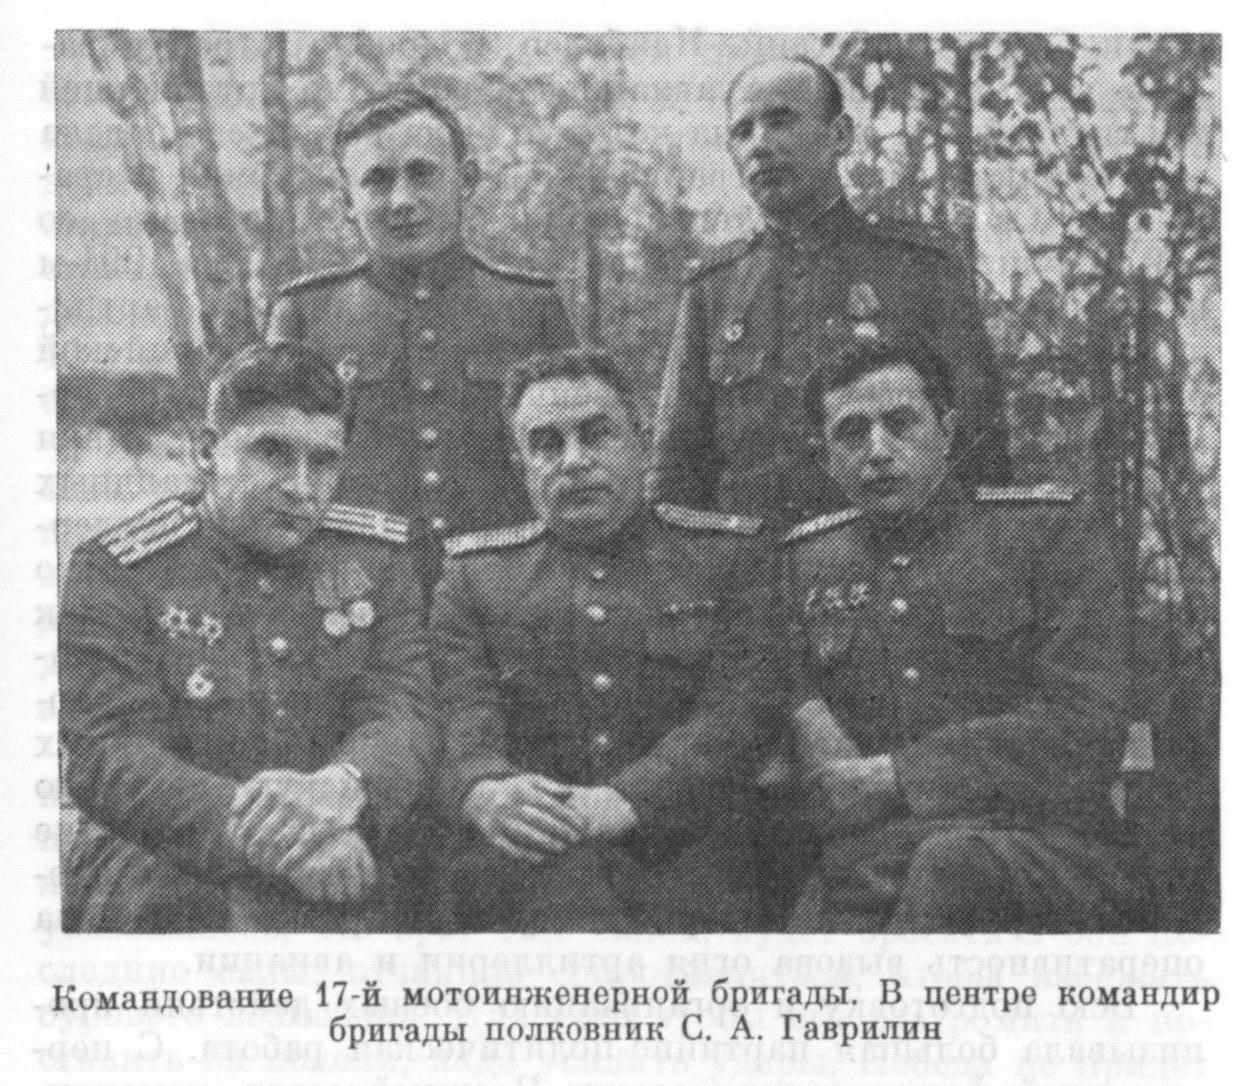 1я гв танковая бригада product_image